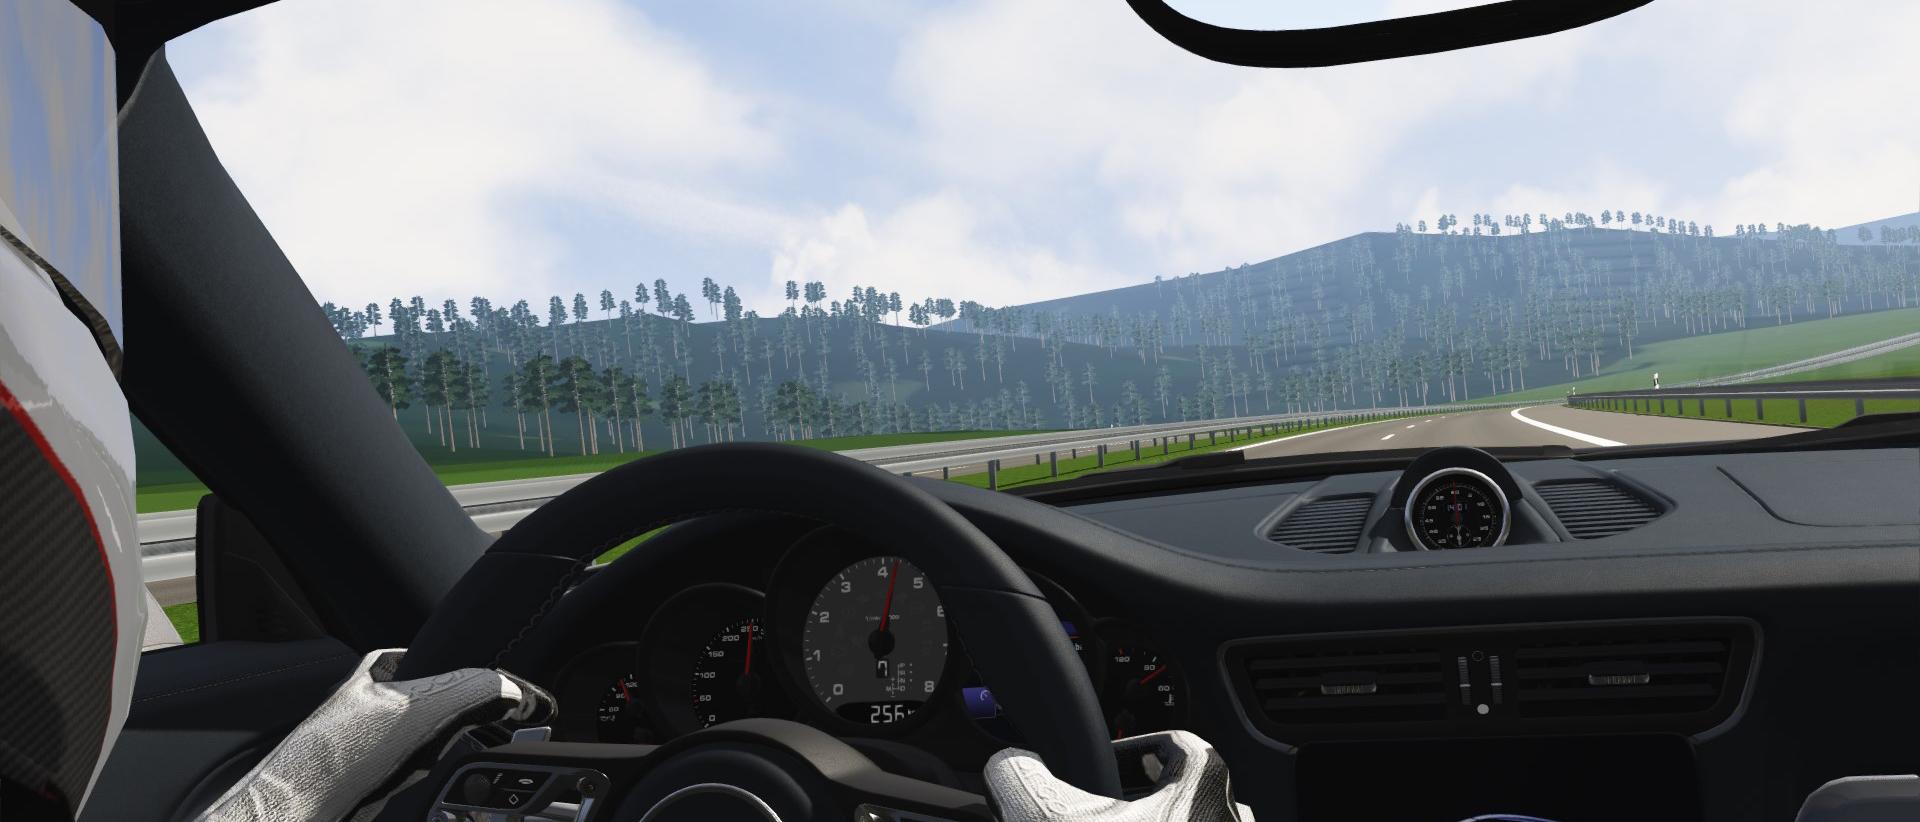 Screenshot_ks_porsche_991_carrera_s_Autobahn_3-12-116-0-4-50.jpg